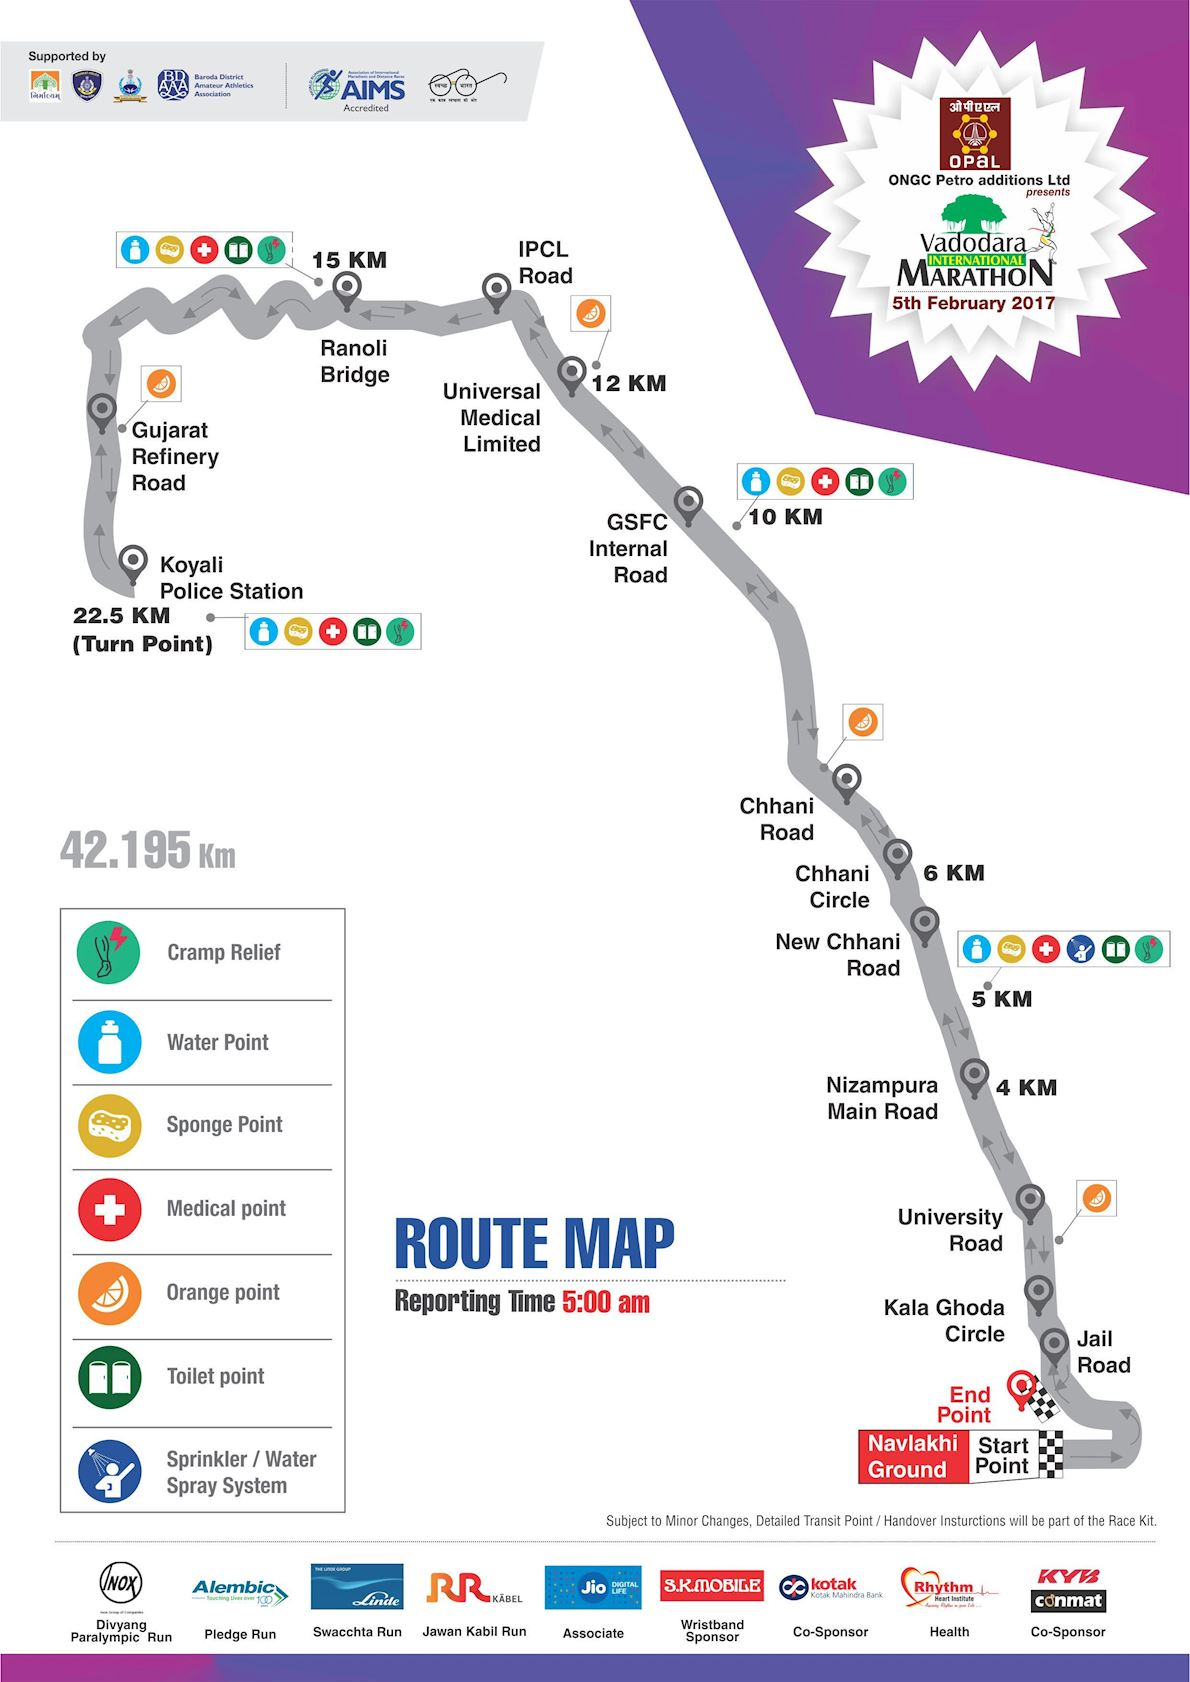 MG Vadodara International Marathon Route Map